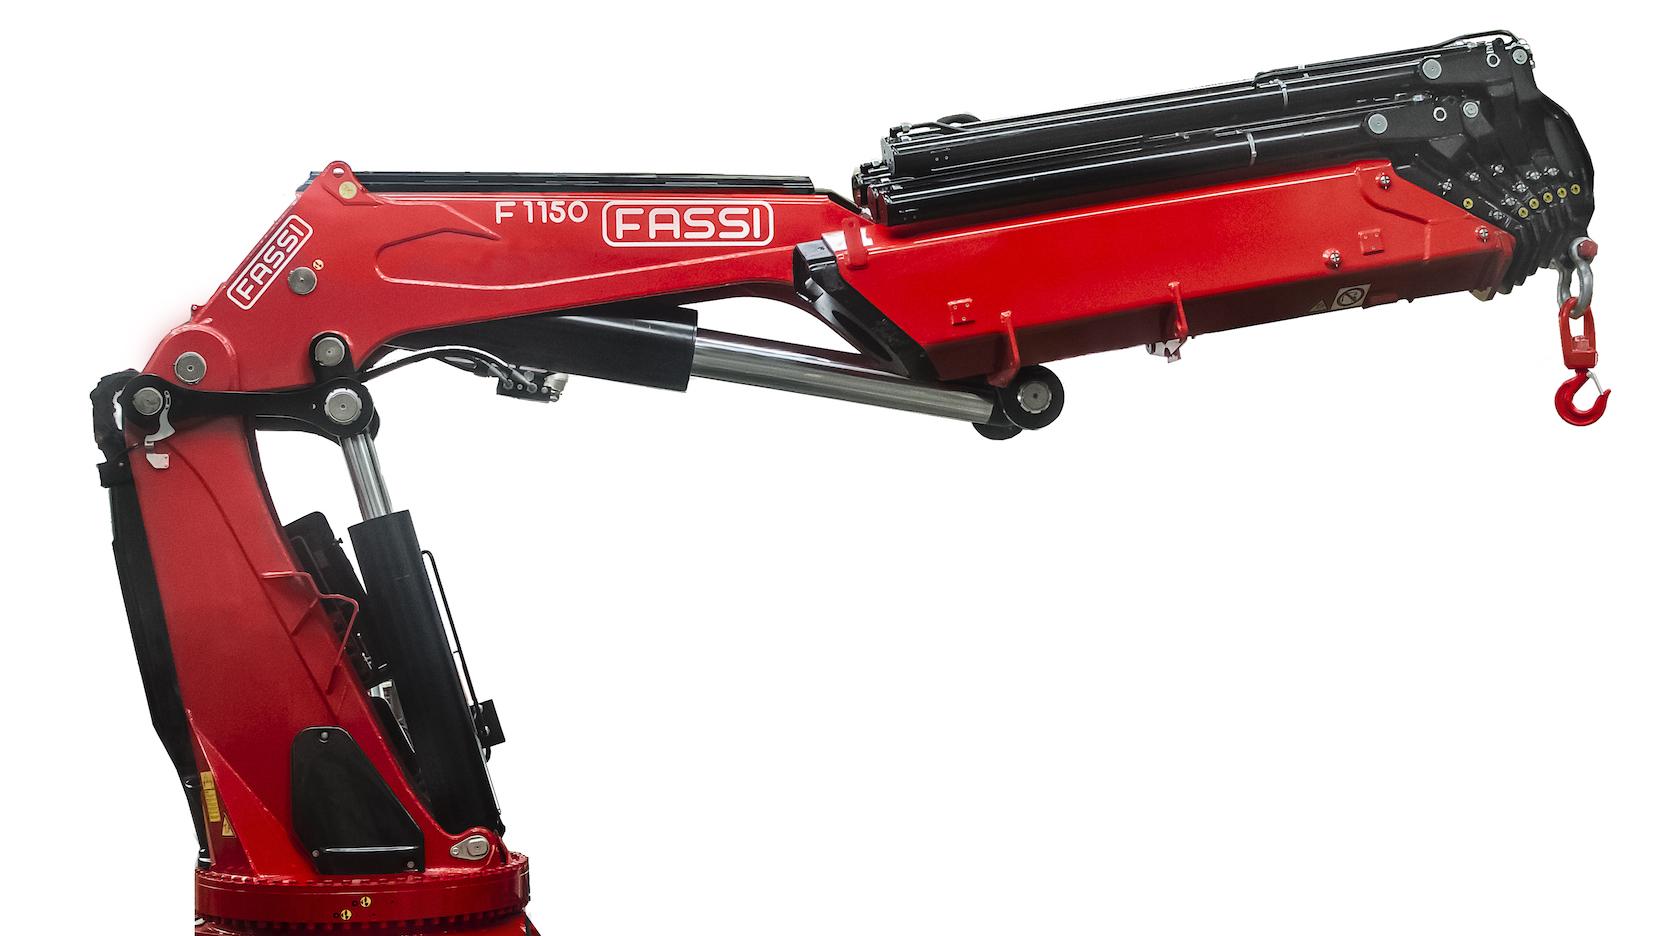 Fassi-F1150RA-xhe-dynamic-1 - copie